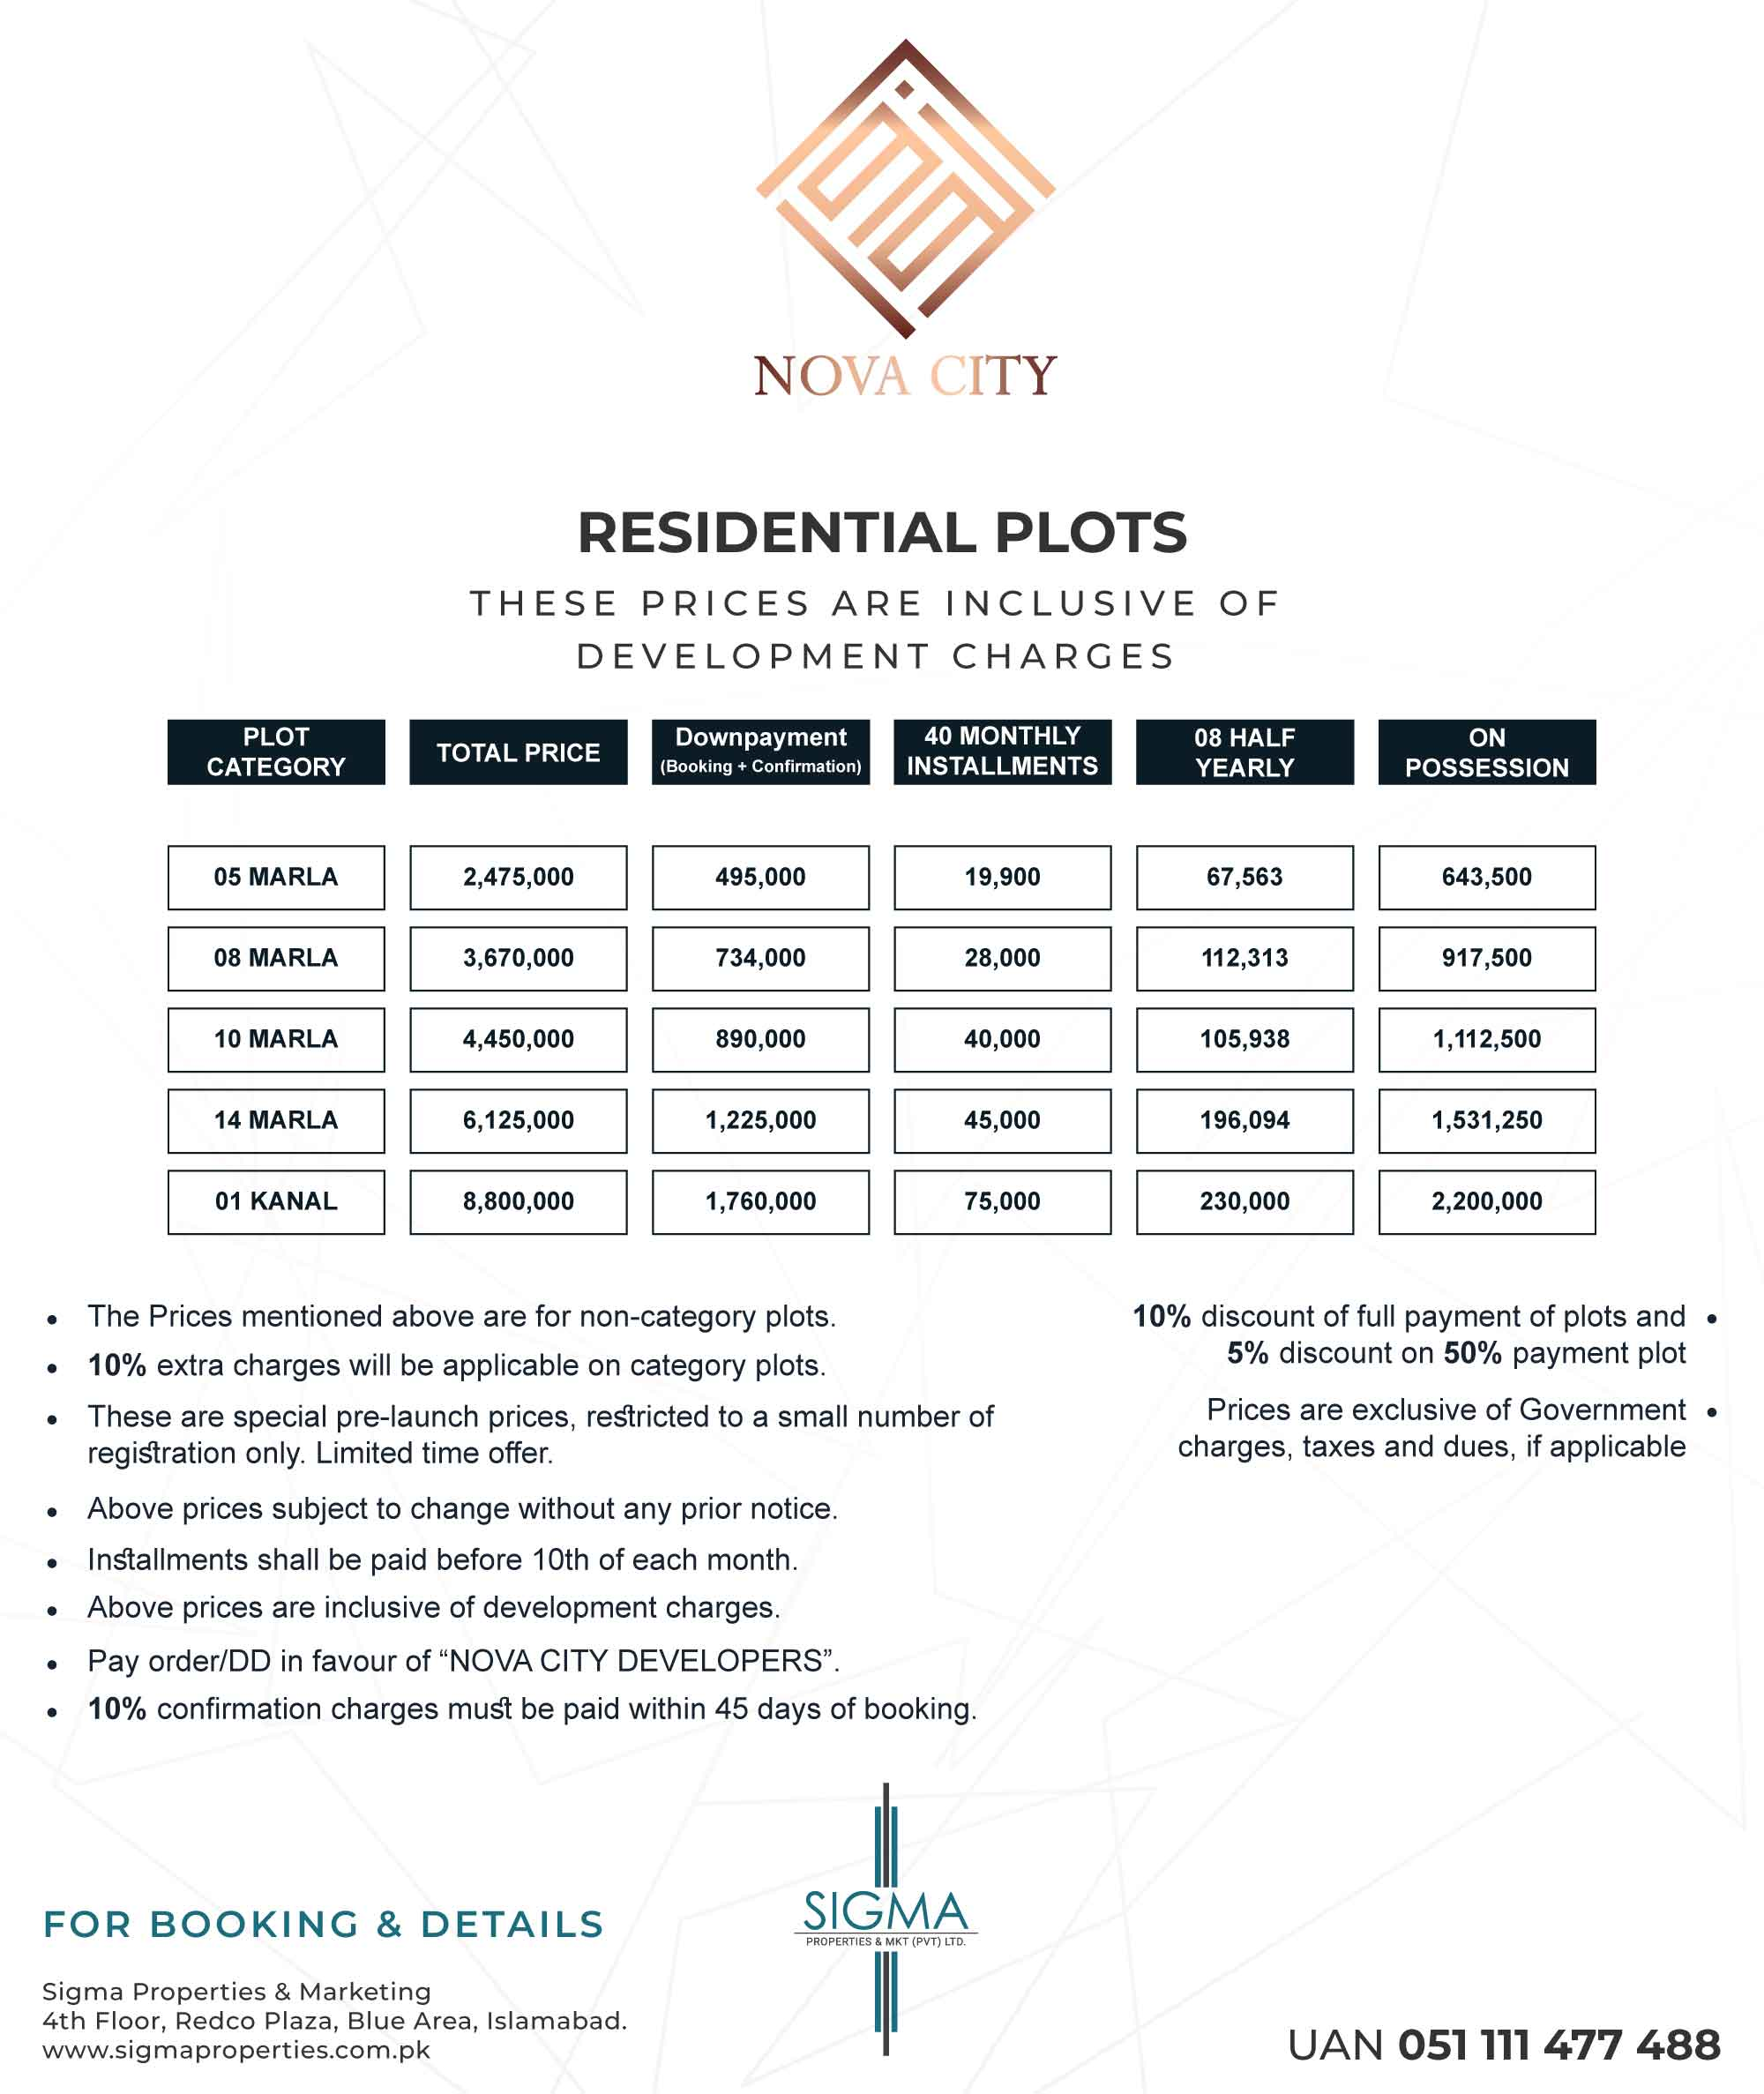 nova city payment plan of residential plots